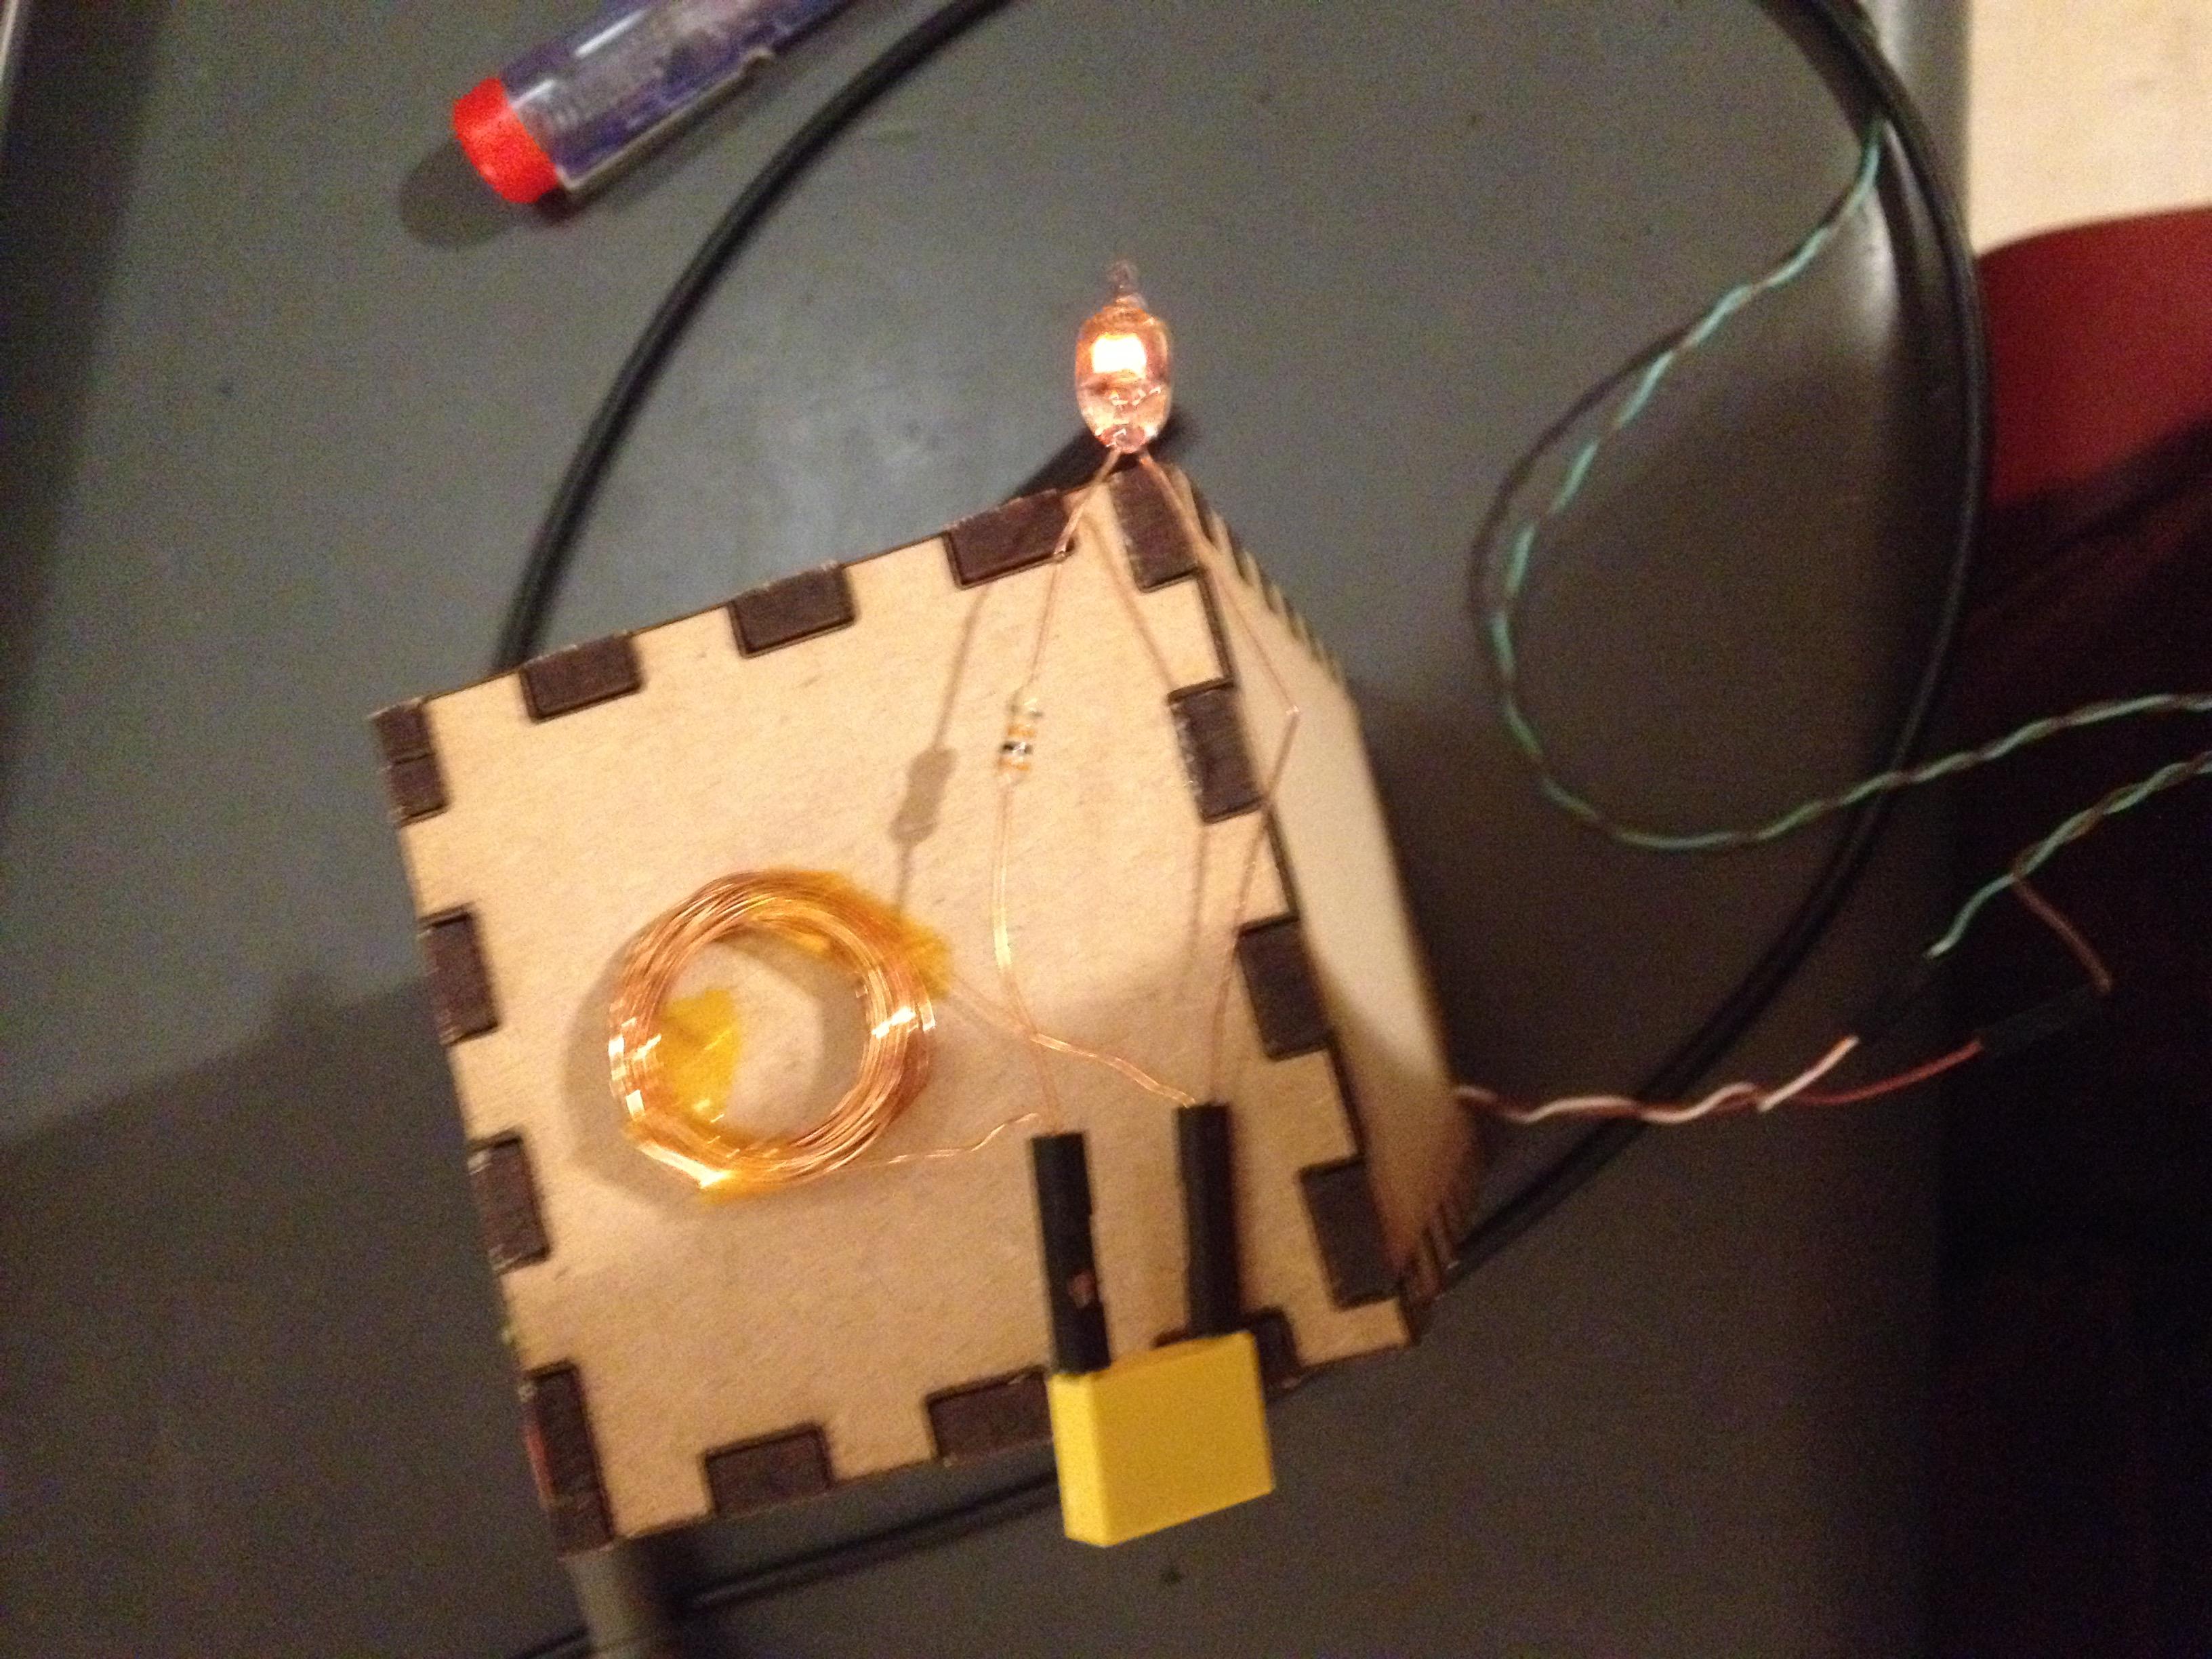 wireless power transfer to a neon bulb